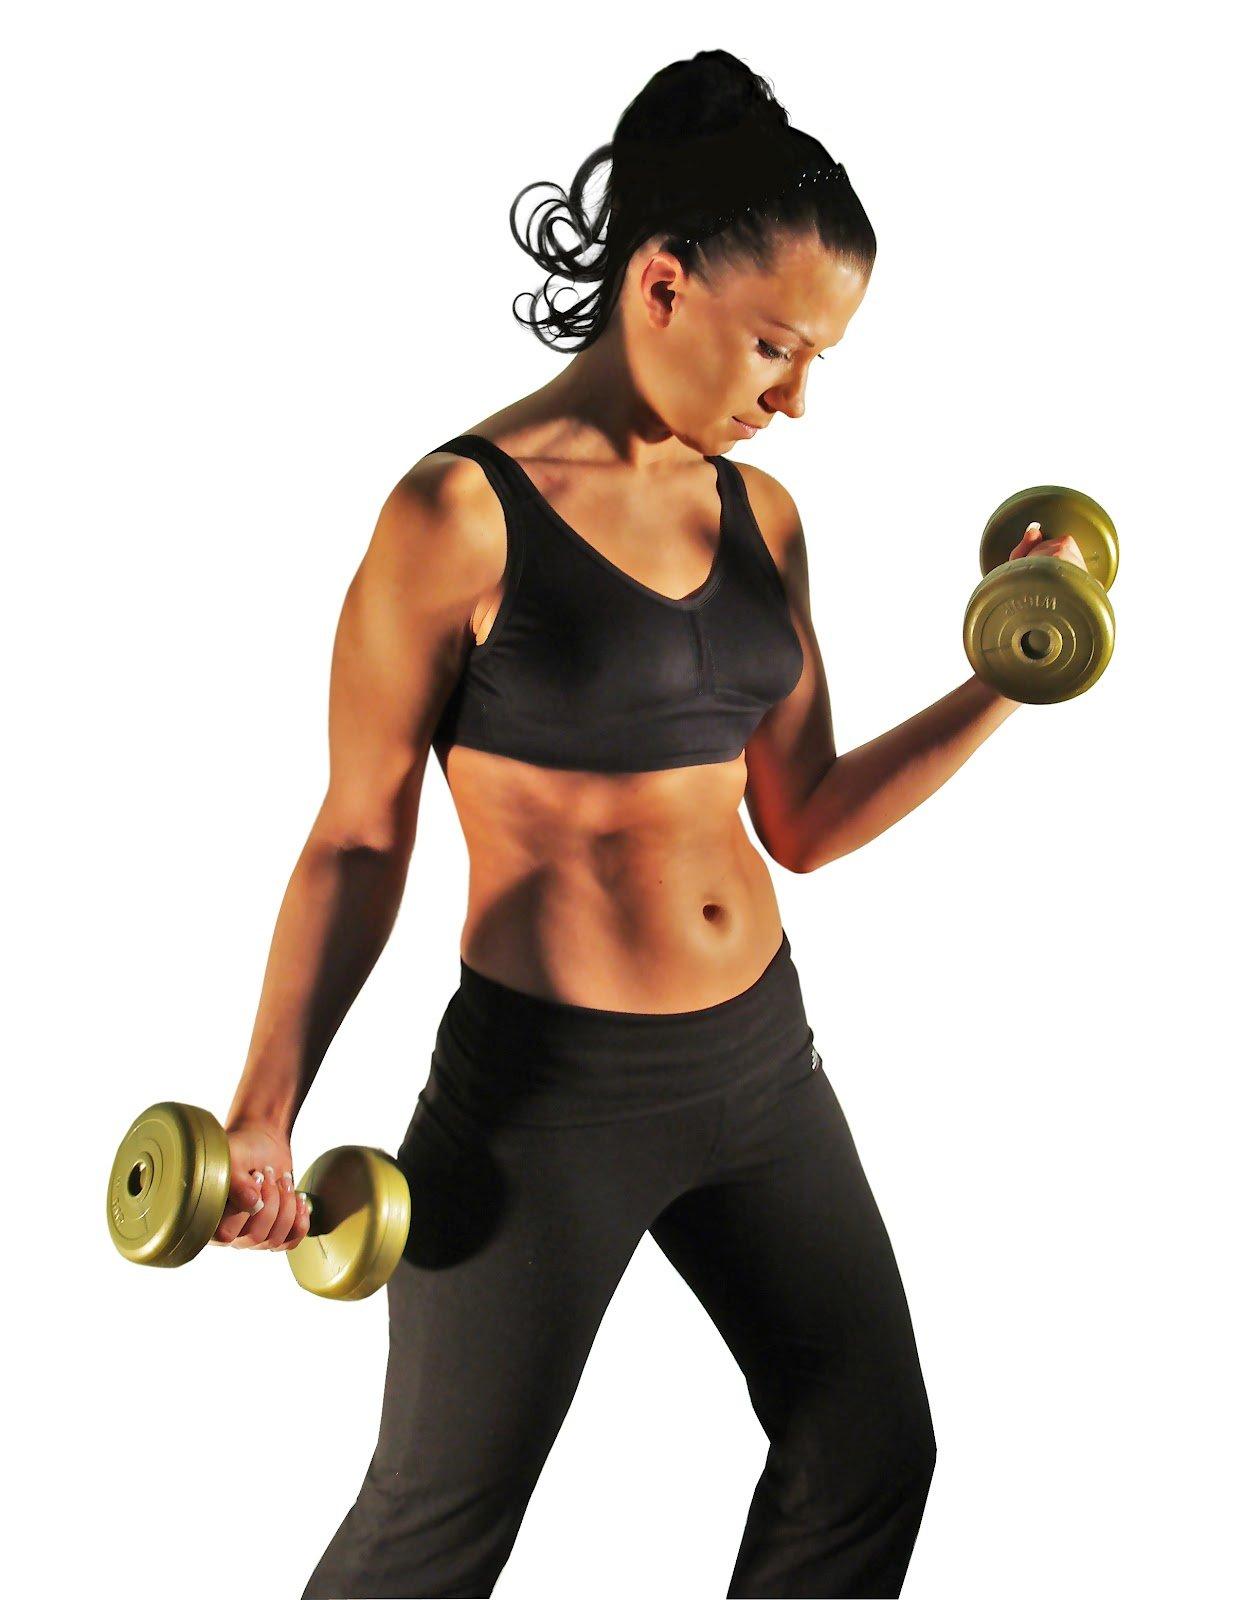 Antrenamentul progresiv, cheia obţinerii rezultatelor dorite